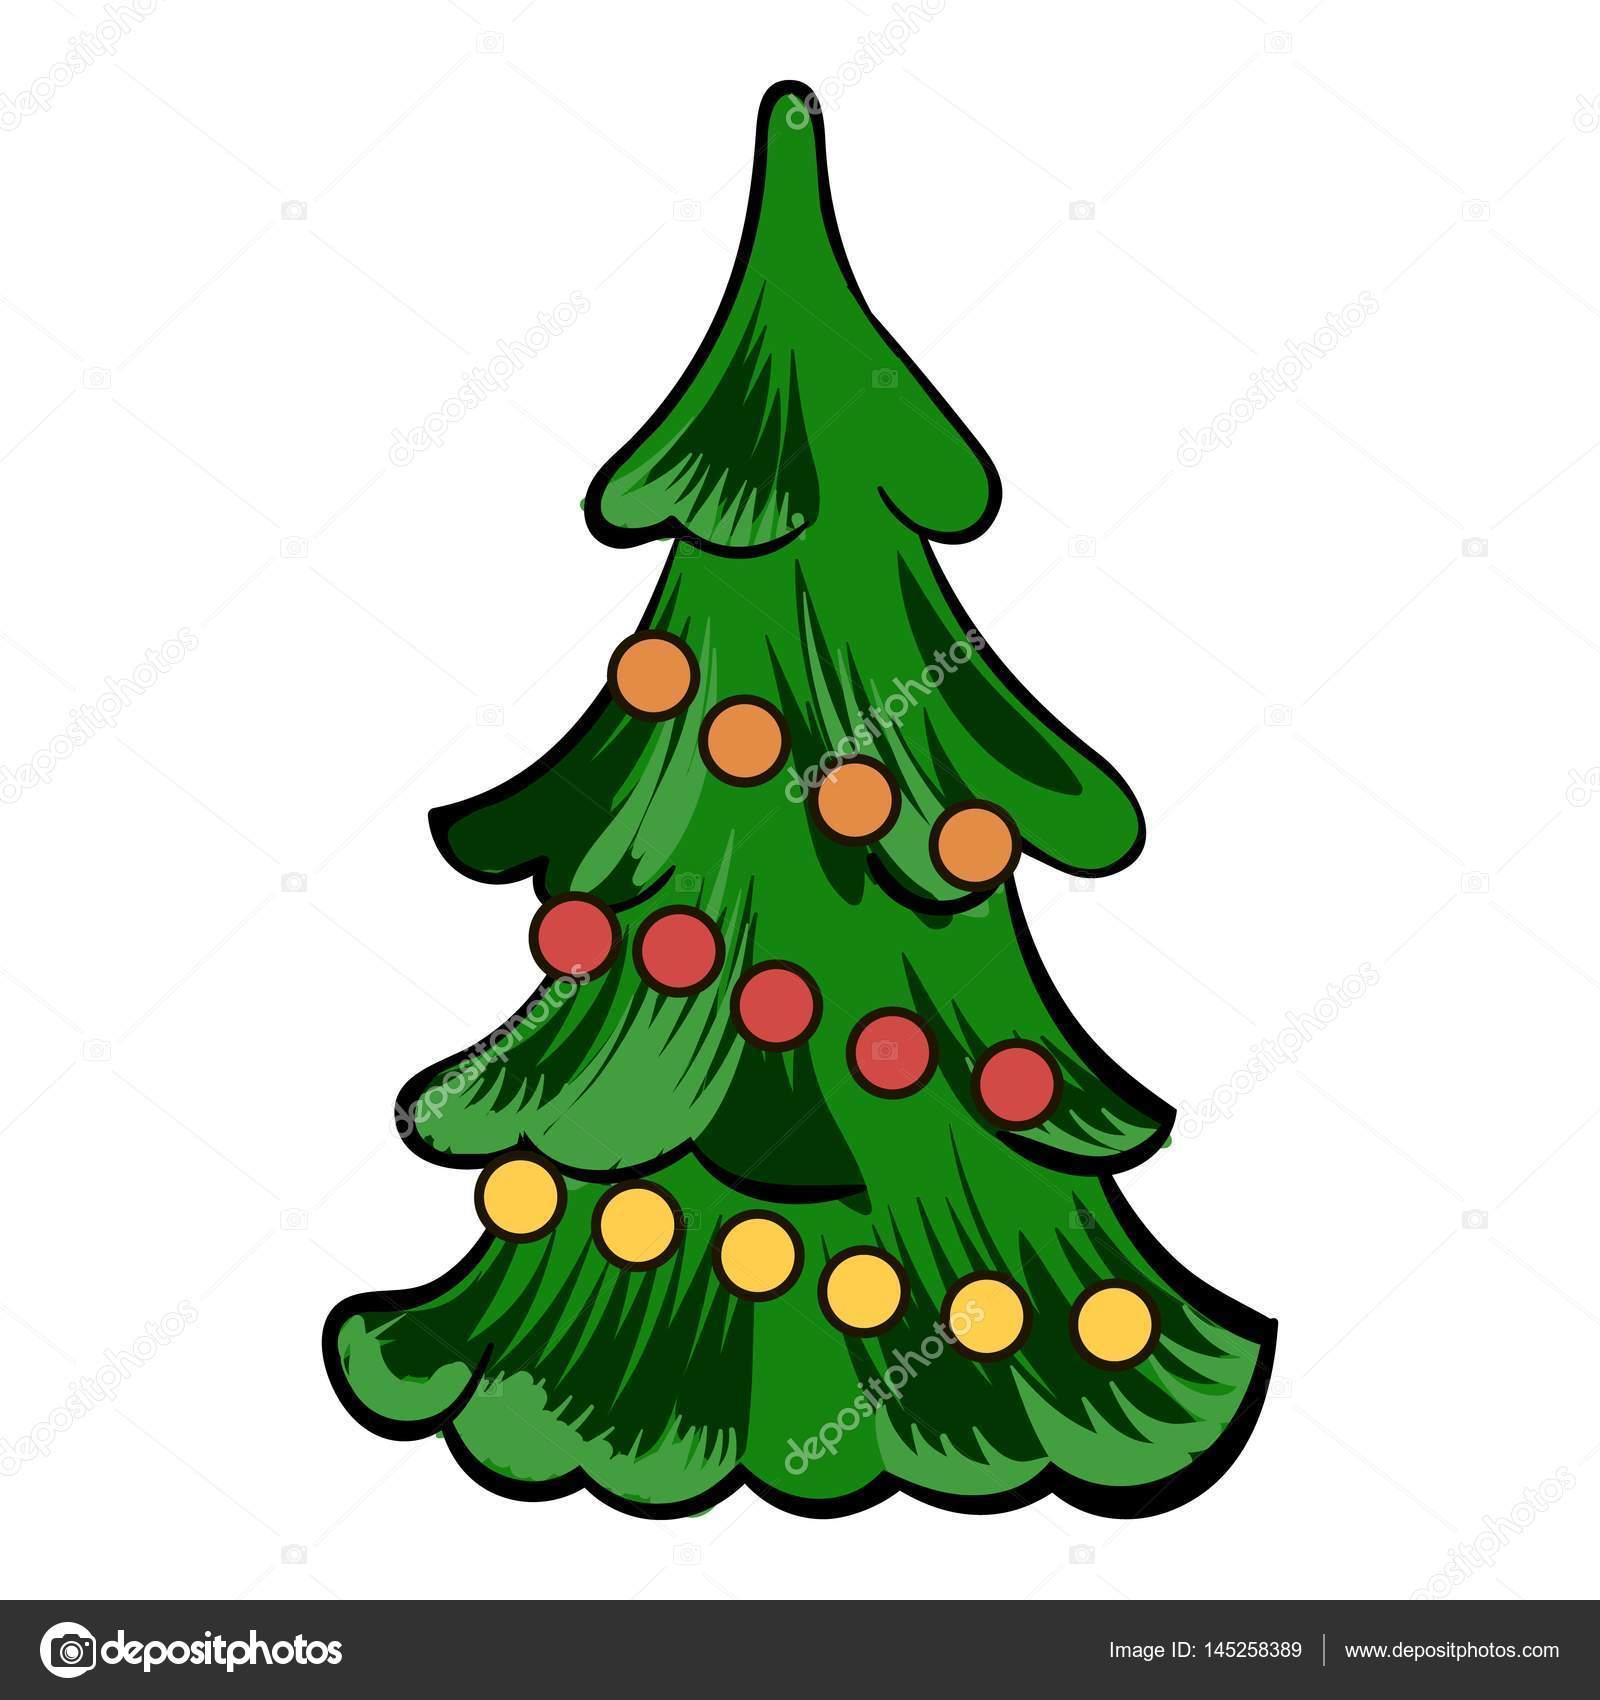 Imagenes Animadas Arboles Navidad.Dibujos Arboles De Navidad Dibujos Animados Icono De